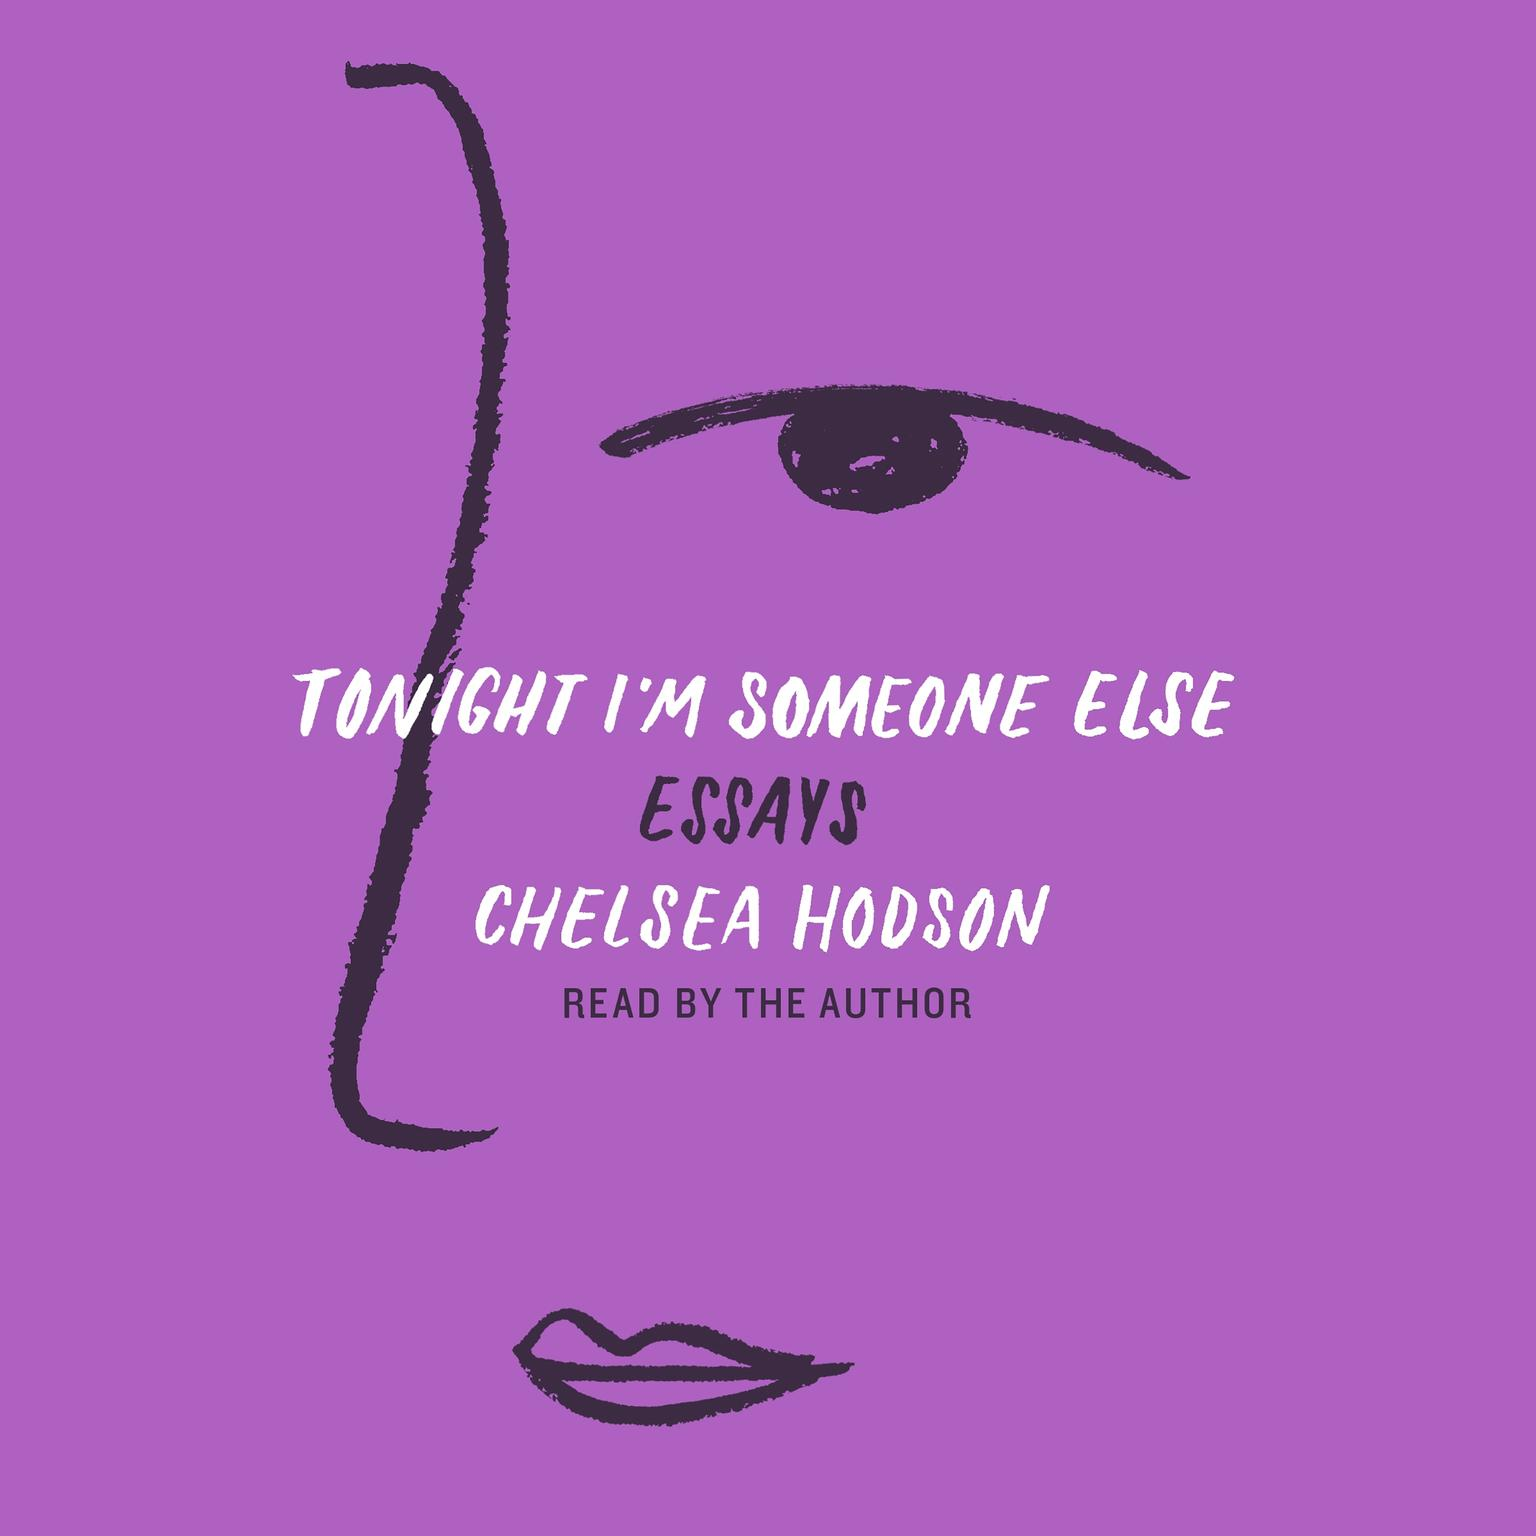 Tonight Im Someone Else: Essays Audiobook, by Chelsea Hodson